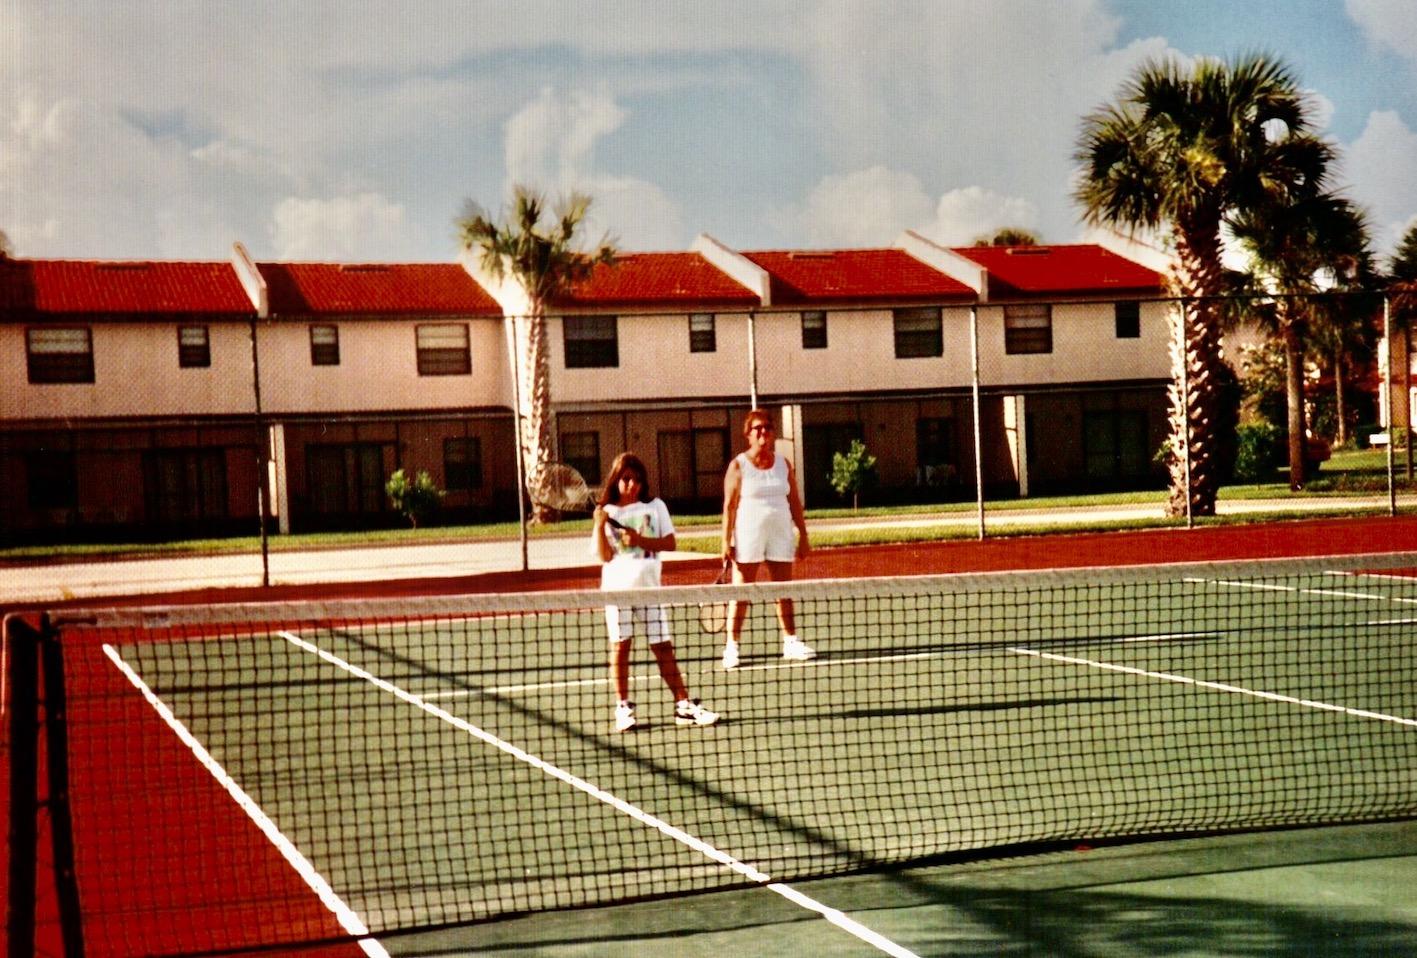 Tennis courts at Fantasy World Club Villas 1994